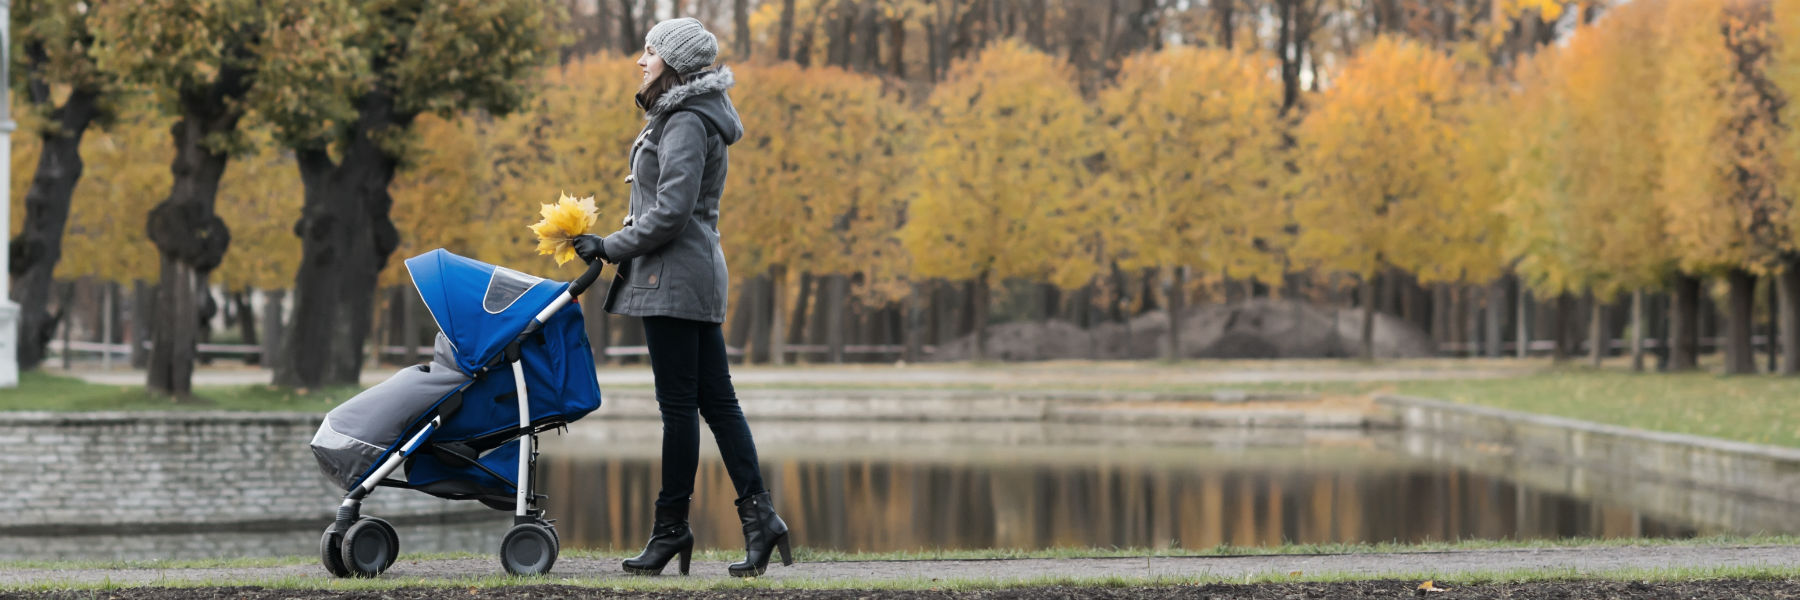 spacerówka na każdą pogodę